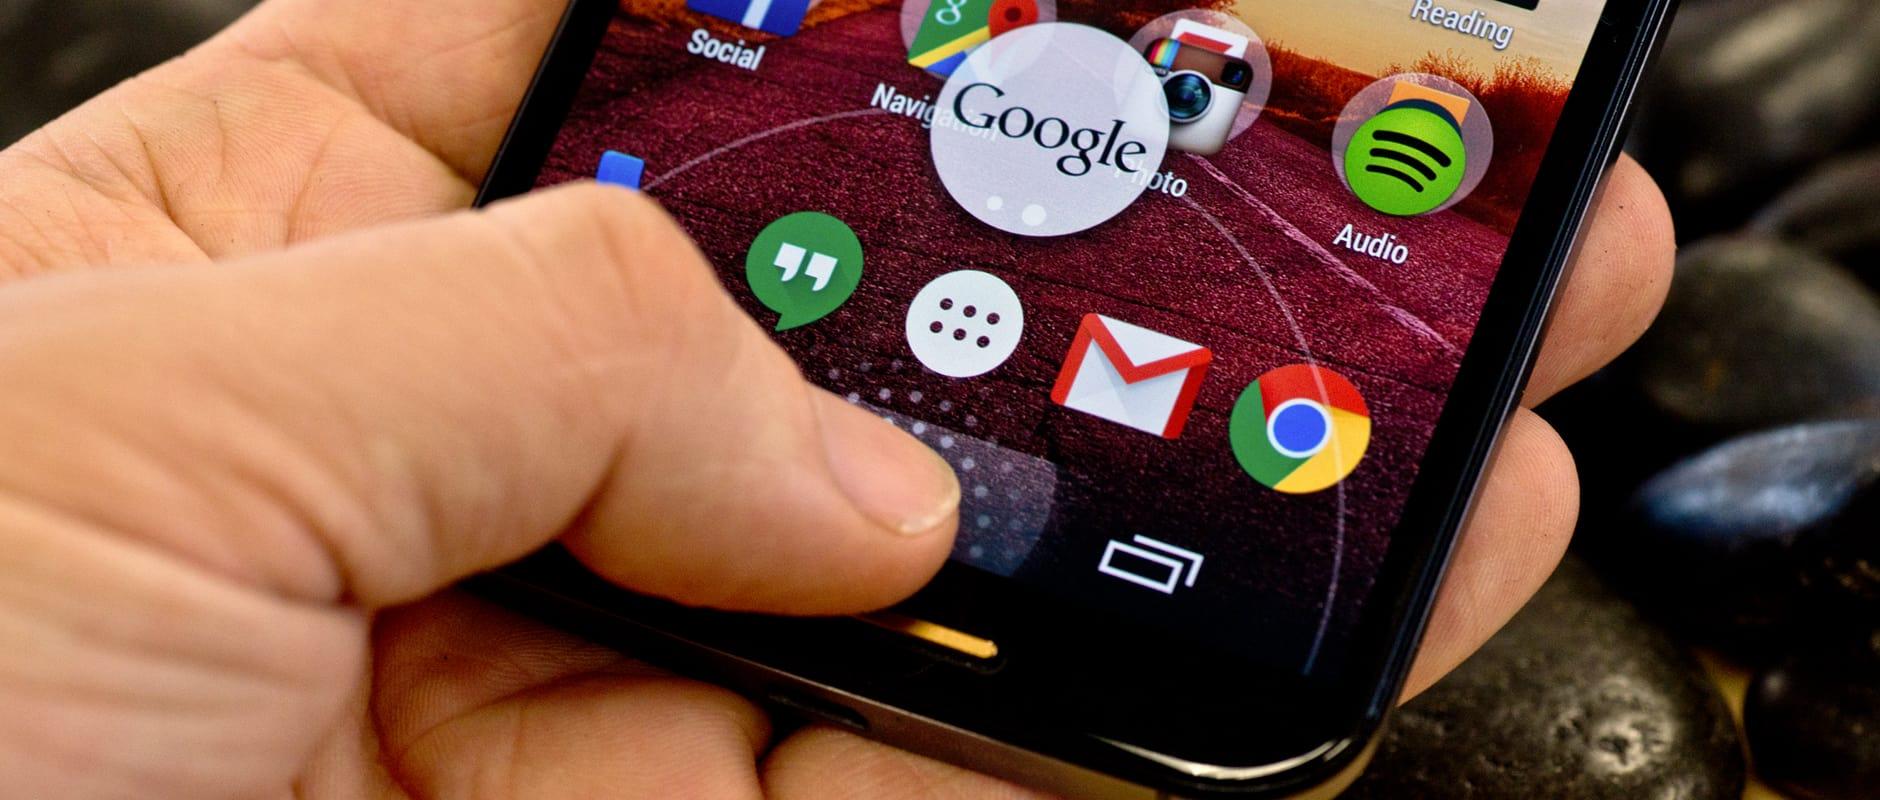 The Google Now shortcut on the Motorola Moto X (2014 edition)